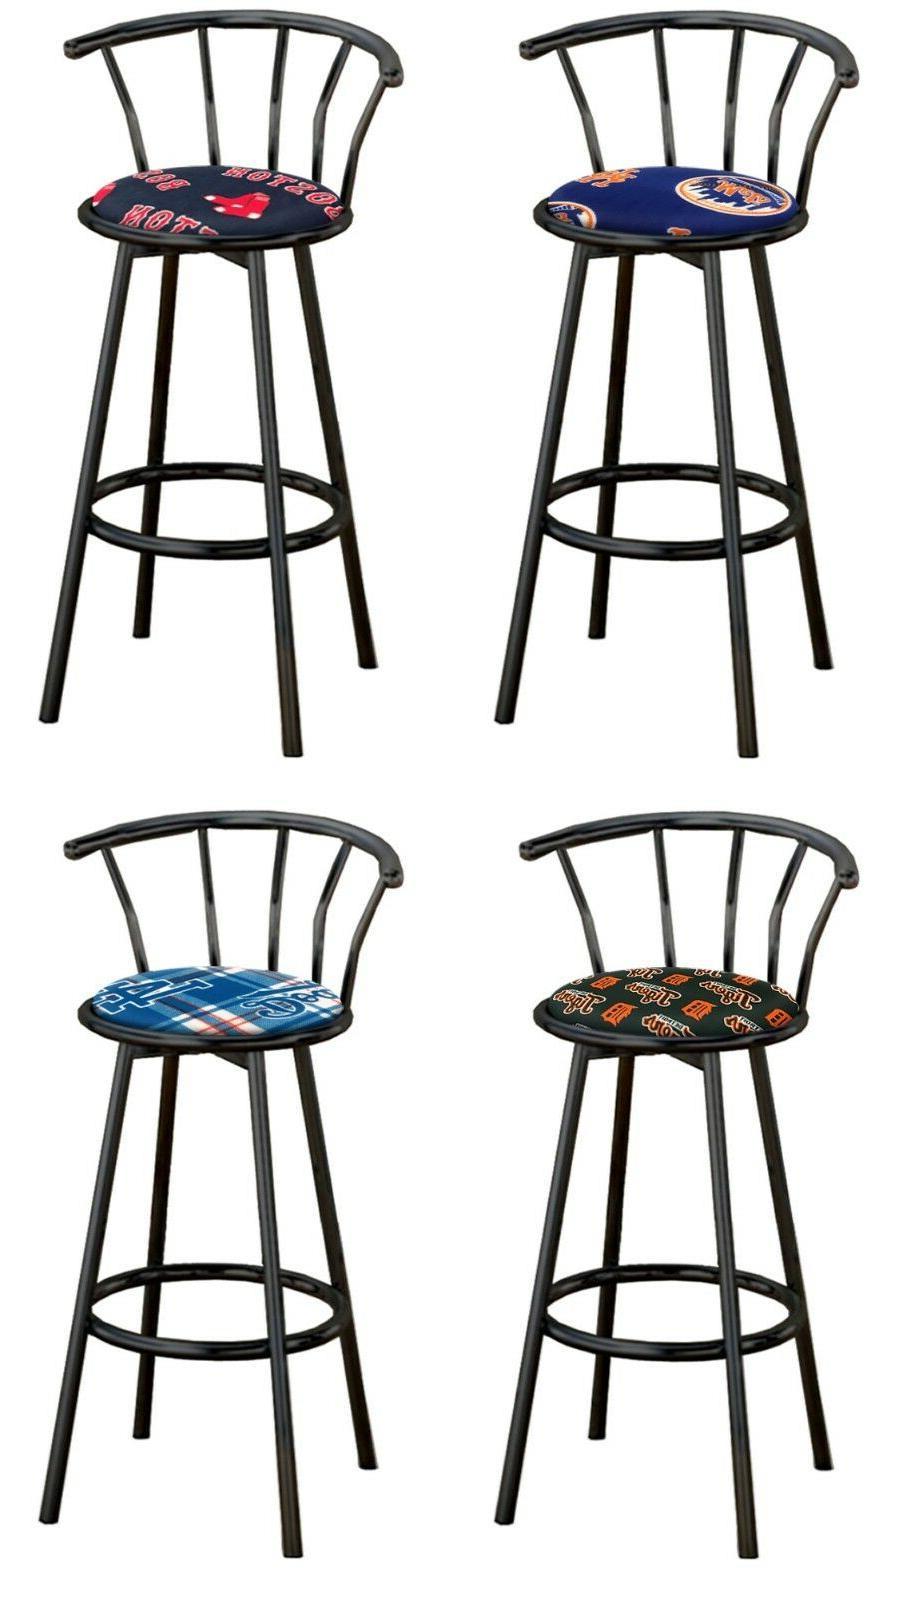 mlb stool 24 or 29 tall black